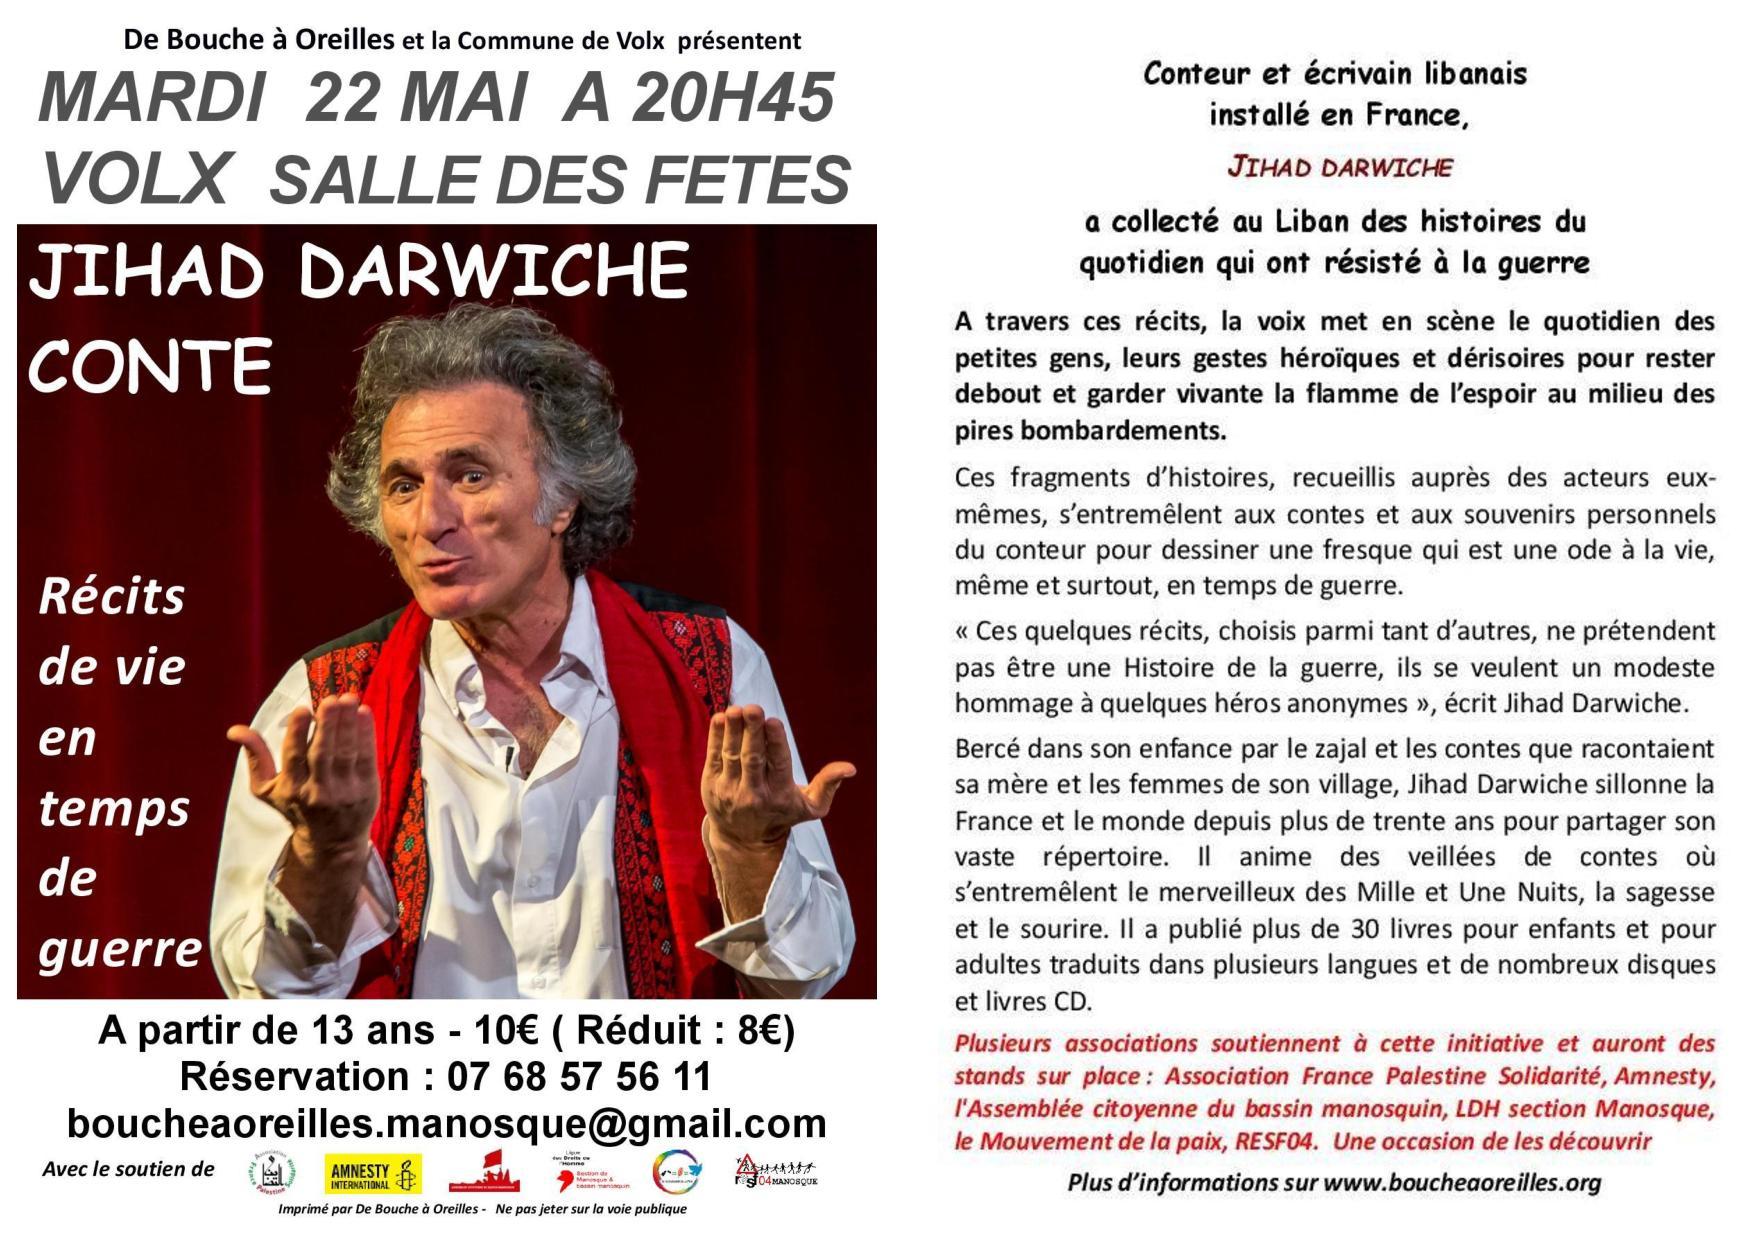 Le conteur Jihad Darwiche à Volx le mardi 22 mai